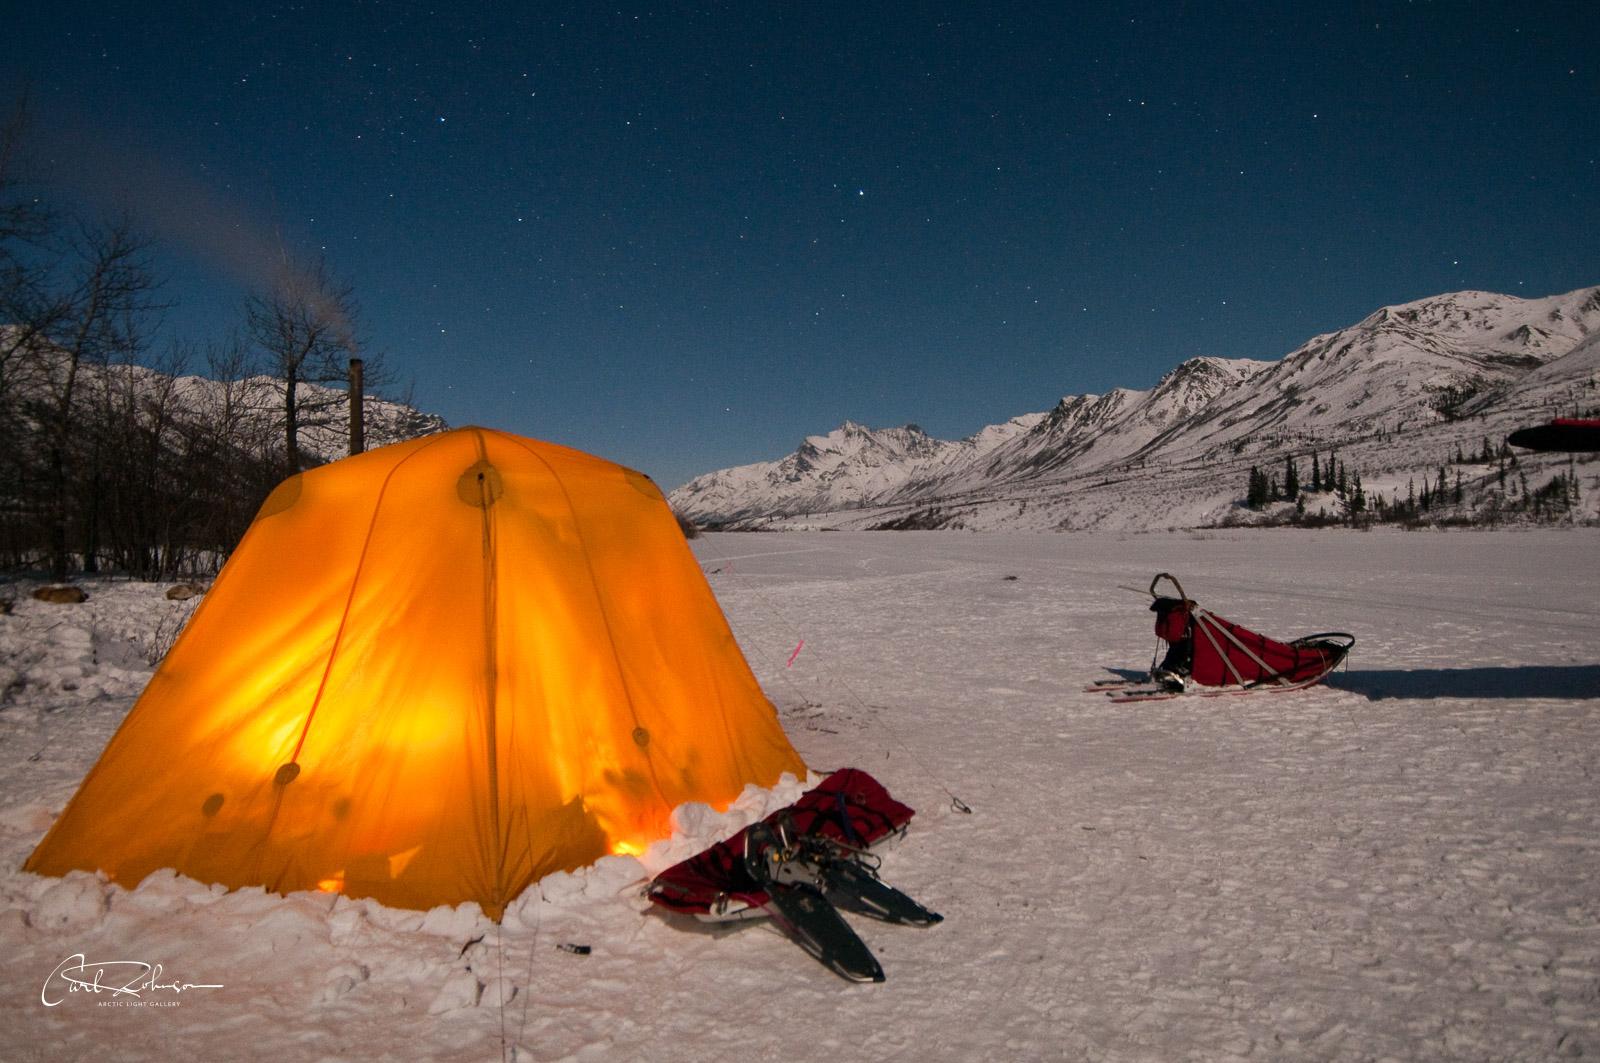 Alaska, Gates of the Arctic National Park & Preserve, North Fork Koyukuk River, camp, dog sled, landscape, national park, nighttime, stars, tent, winter, photo